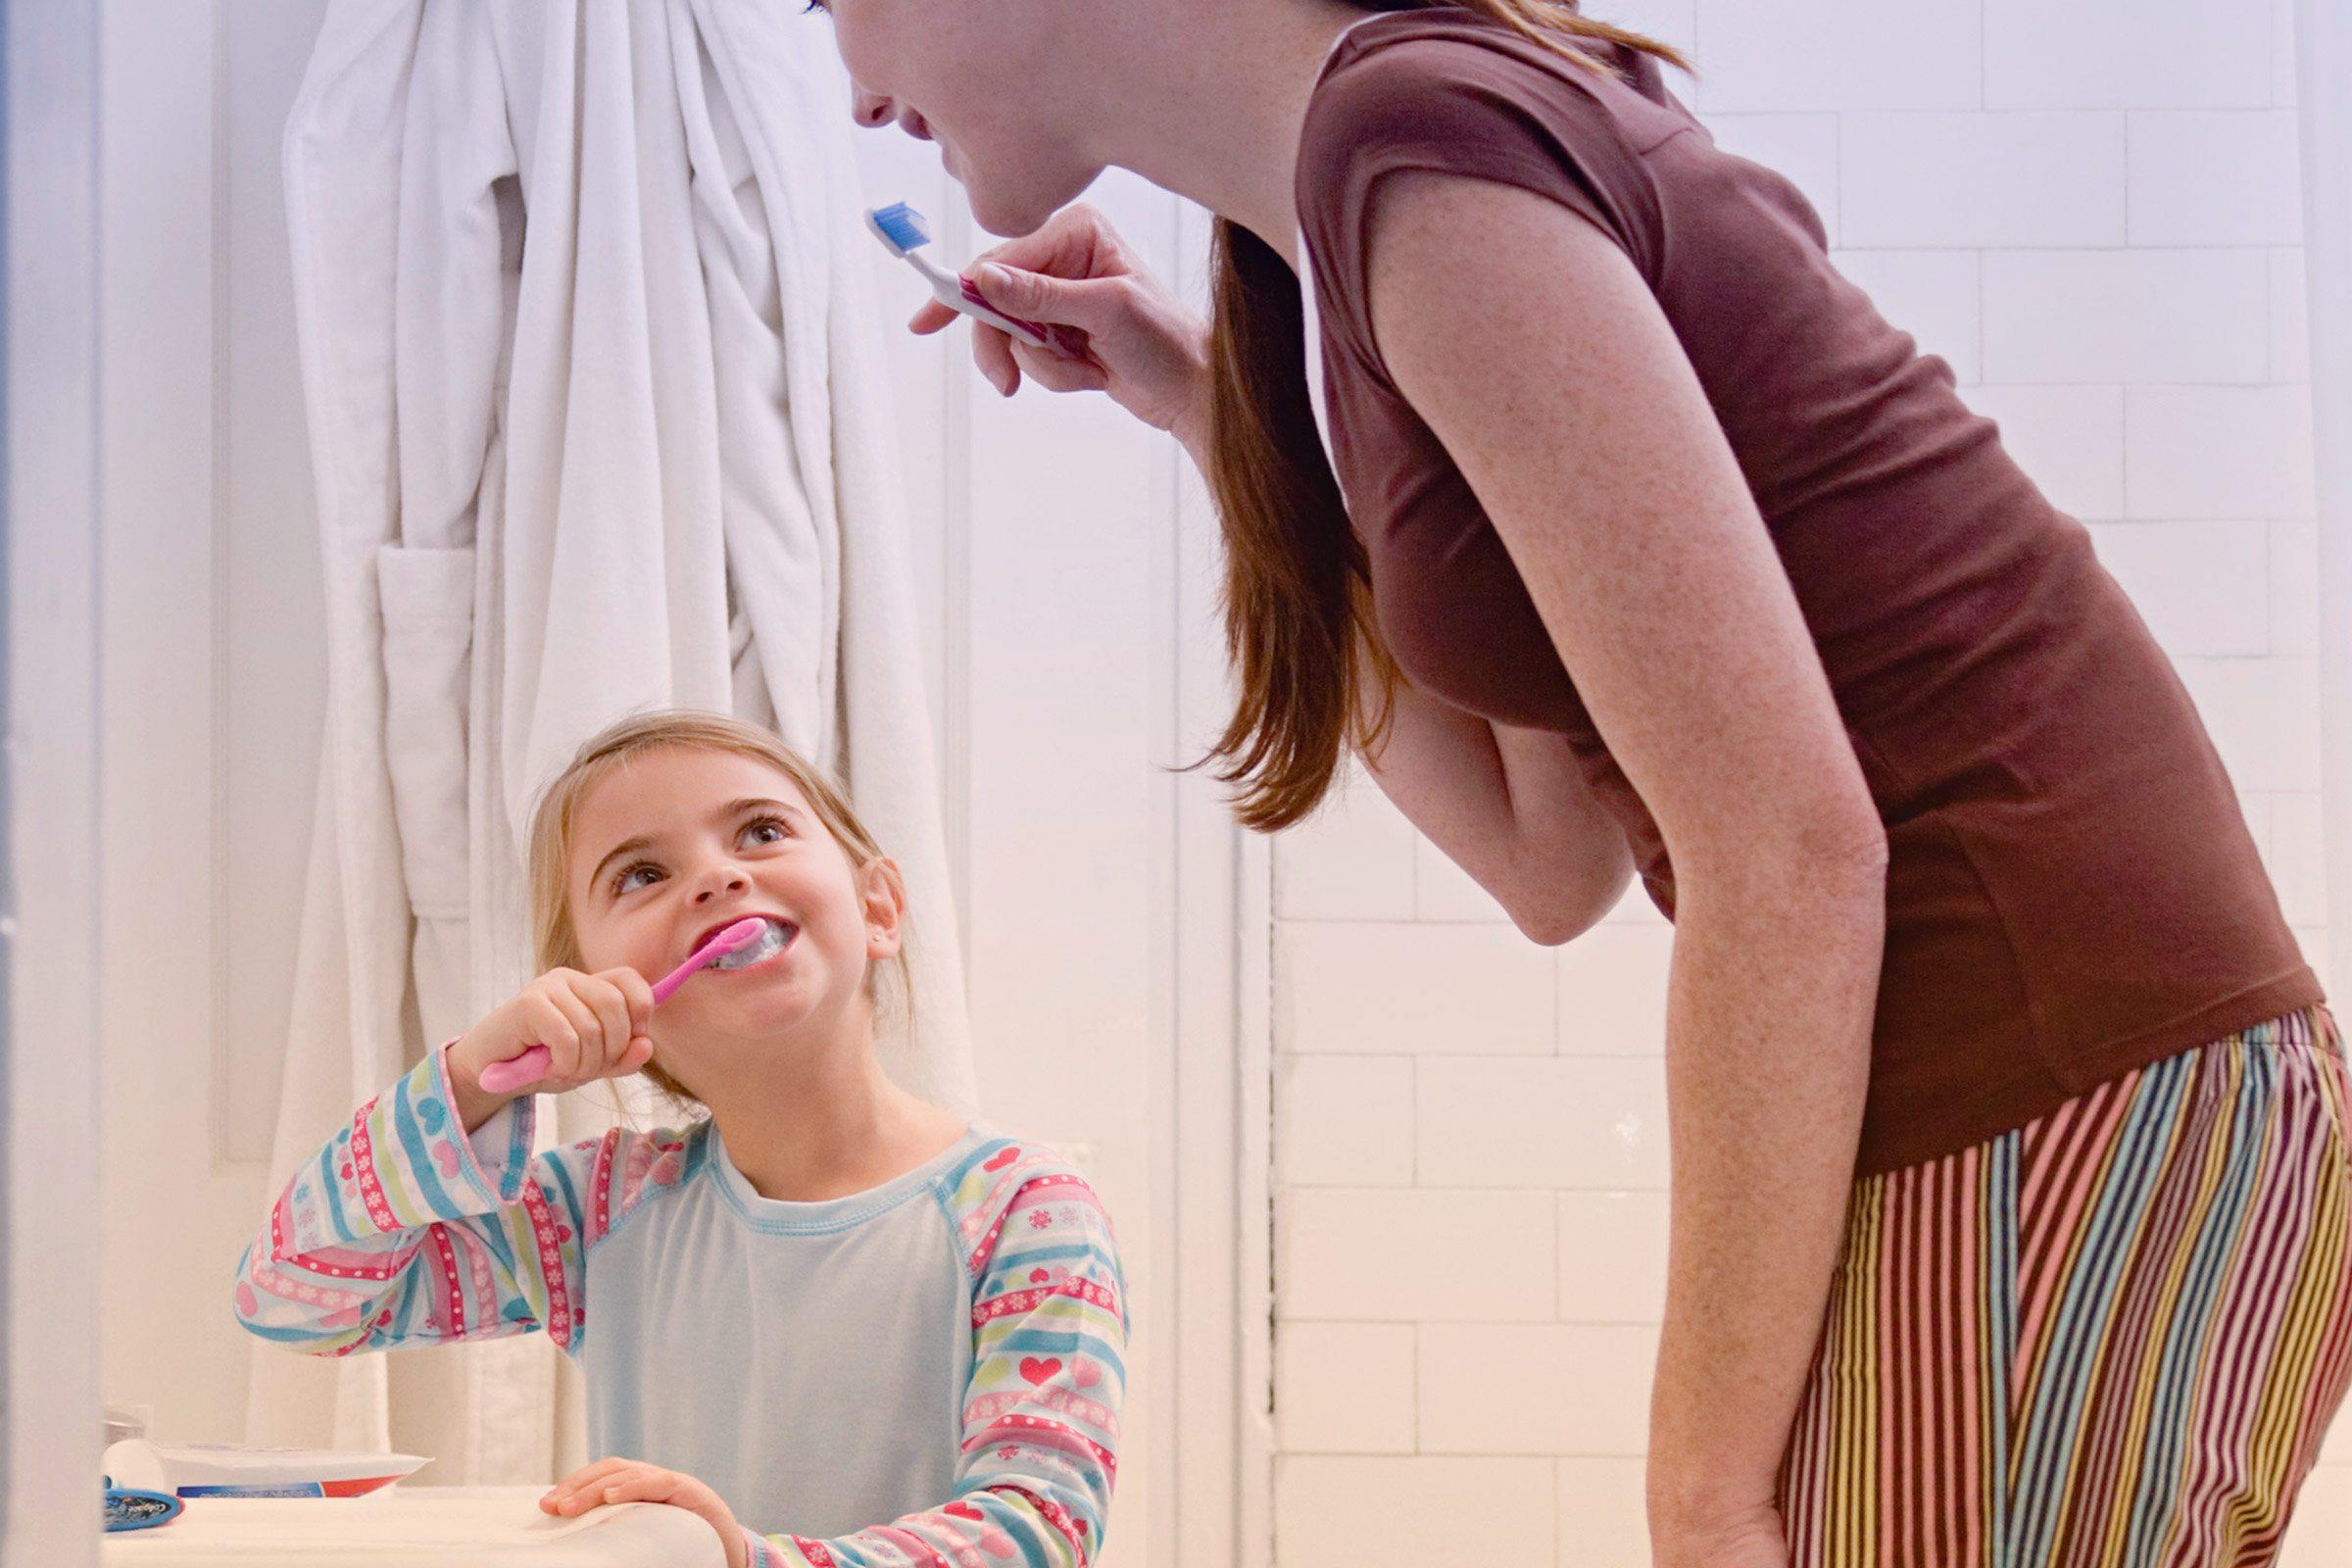 Brushing your teeth: helpful.